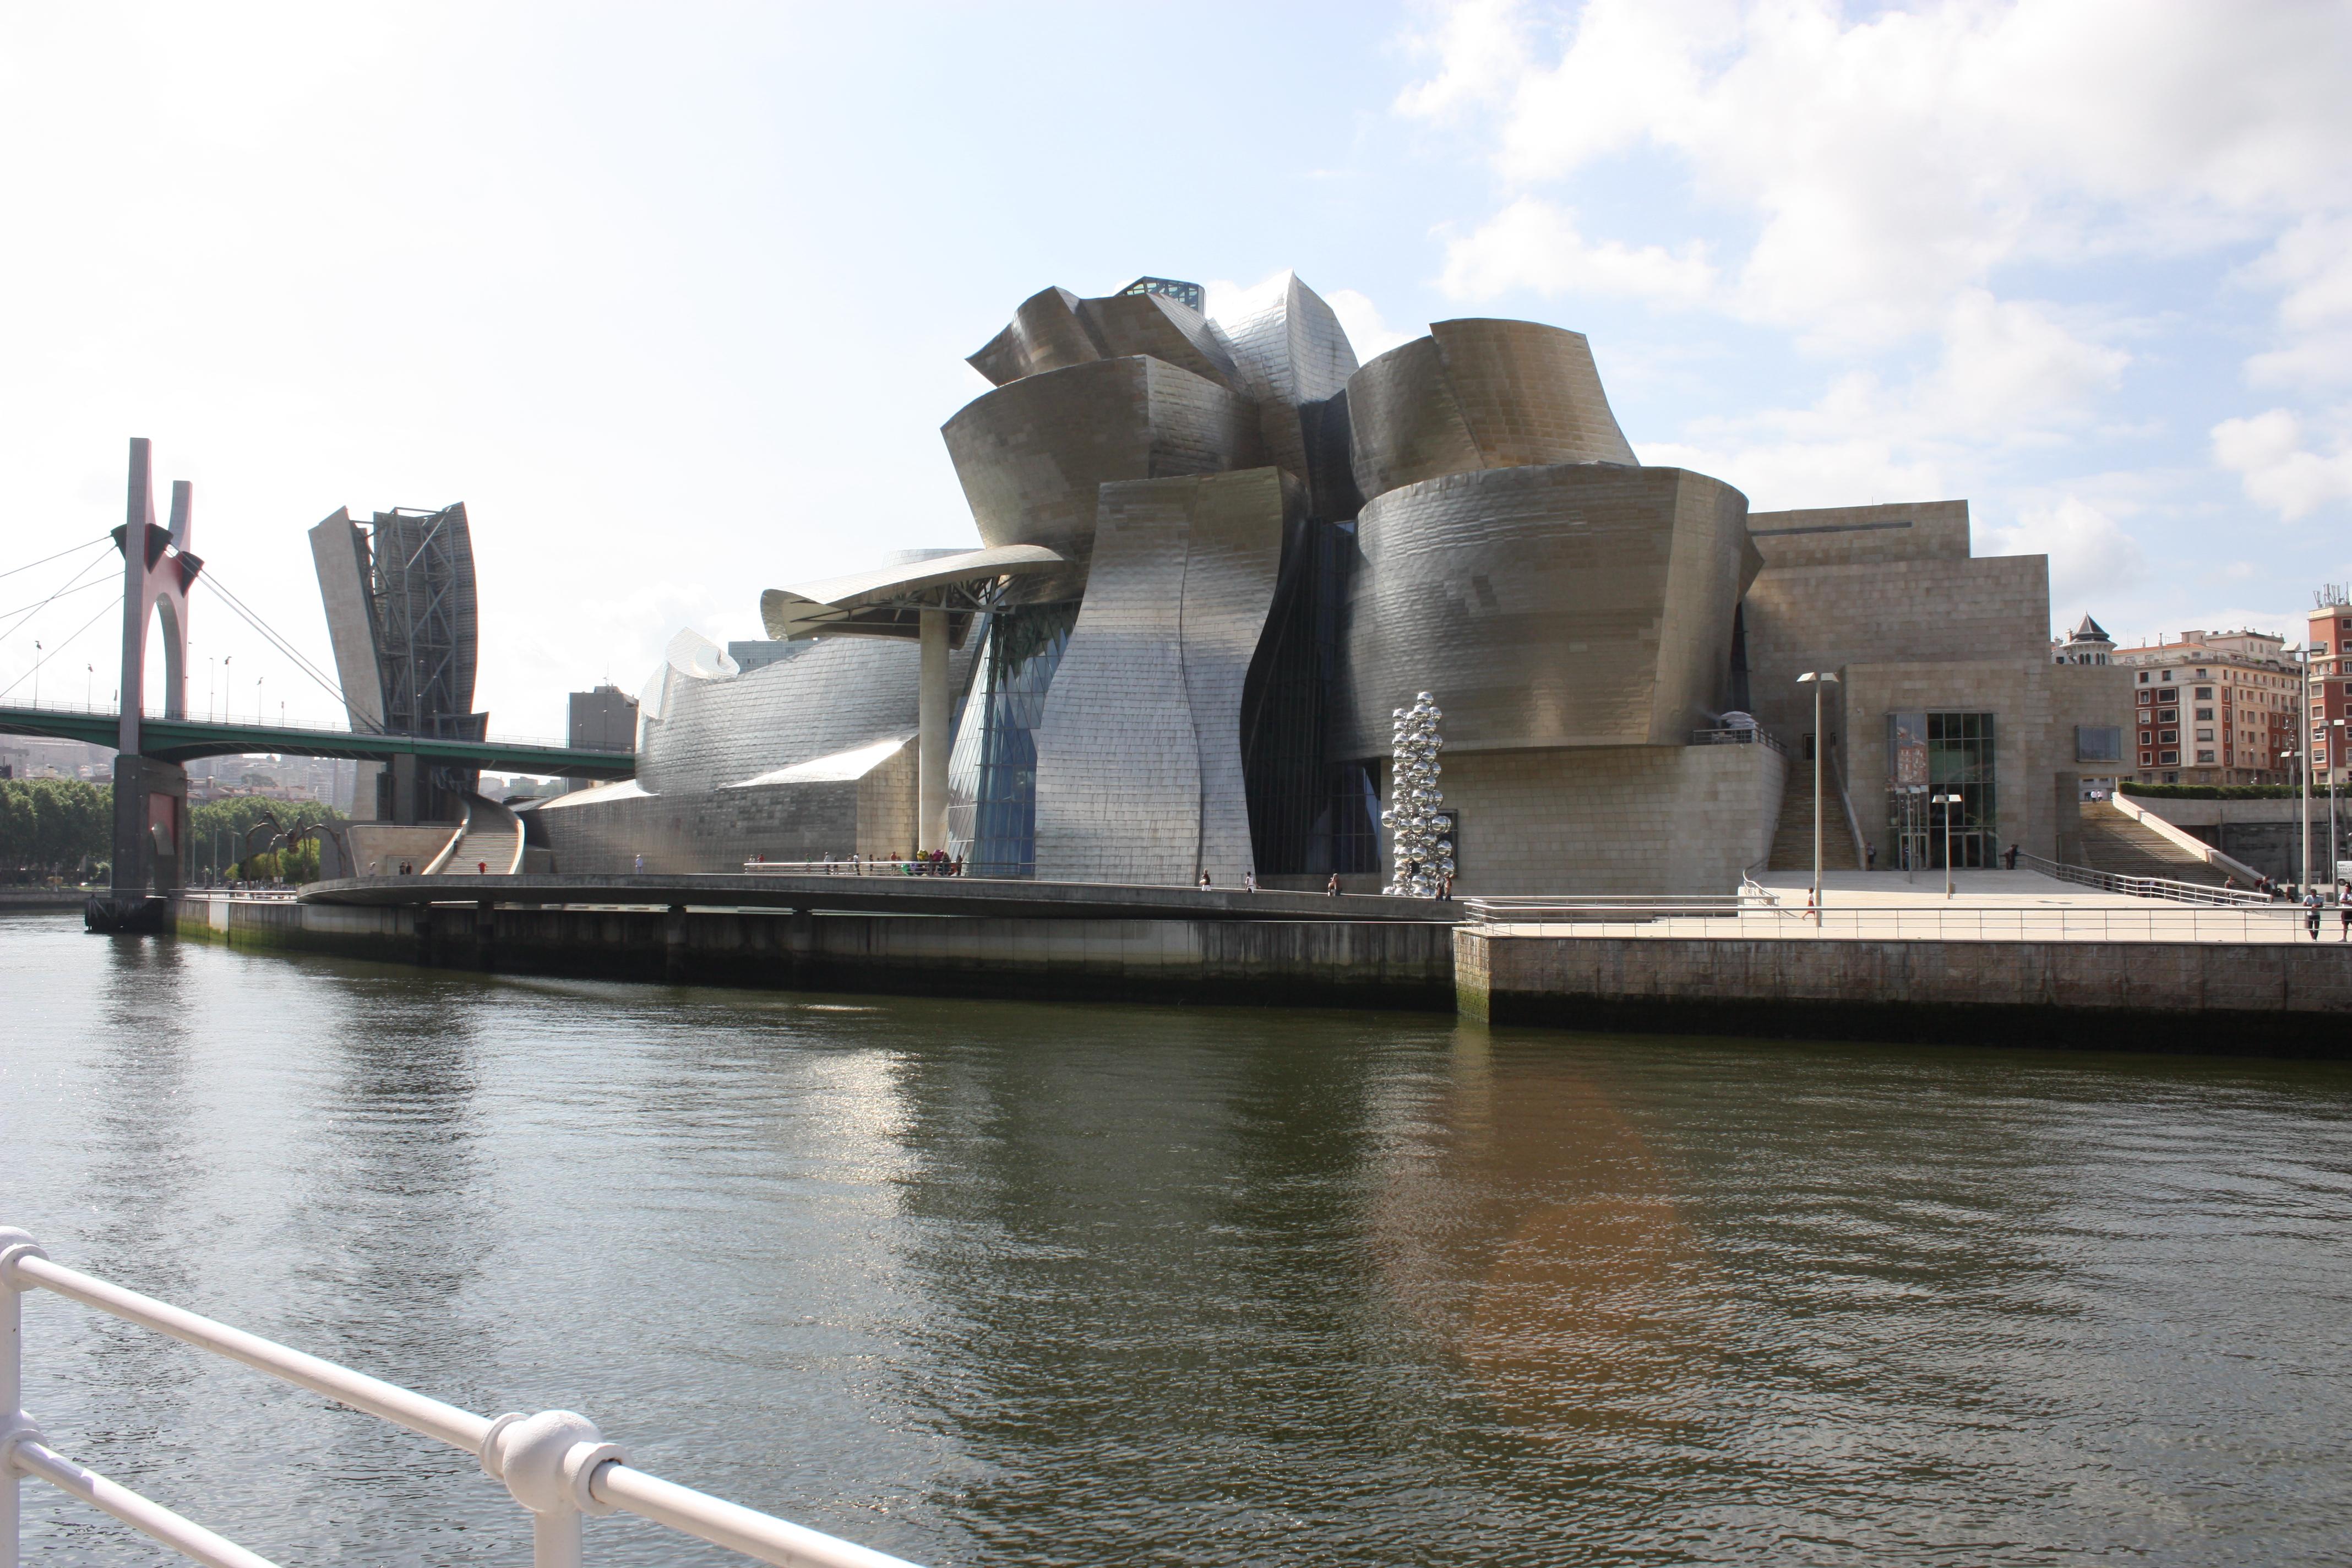 File:Guggenheim Museum, Bilbao, July 2010 (05).JPG